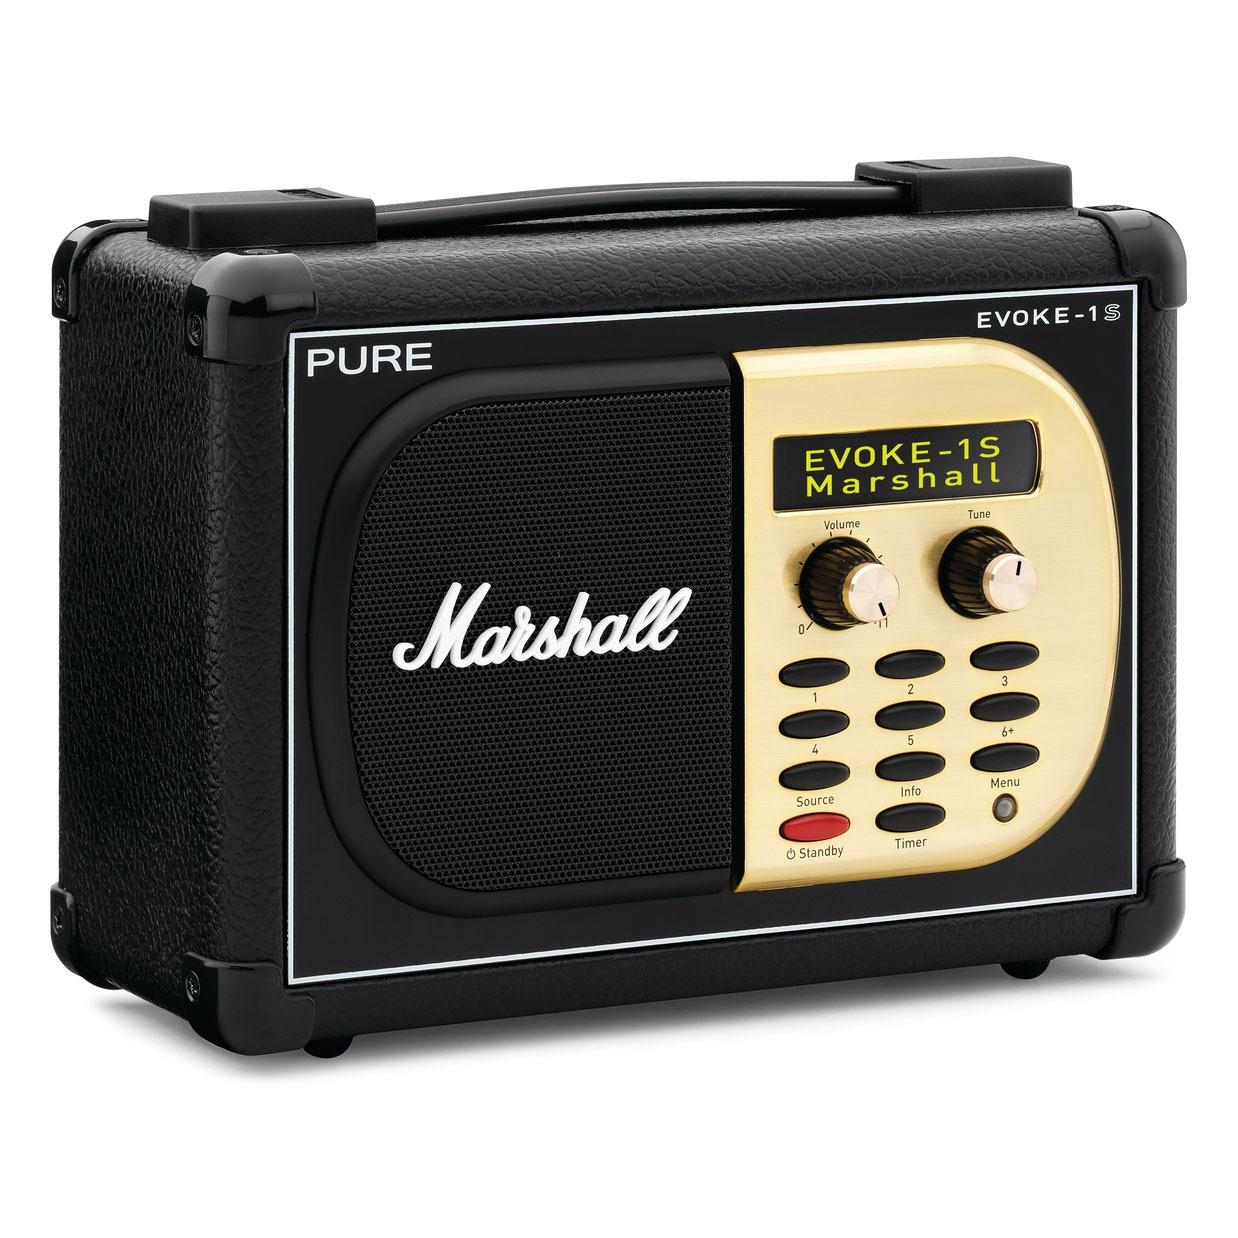 Radio & radio réveil Pure Evoke-1S Marshall Radio FM portable compatible RNT